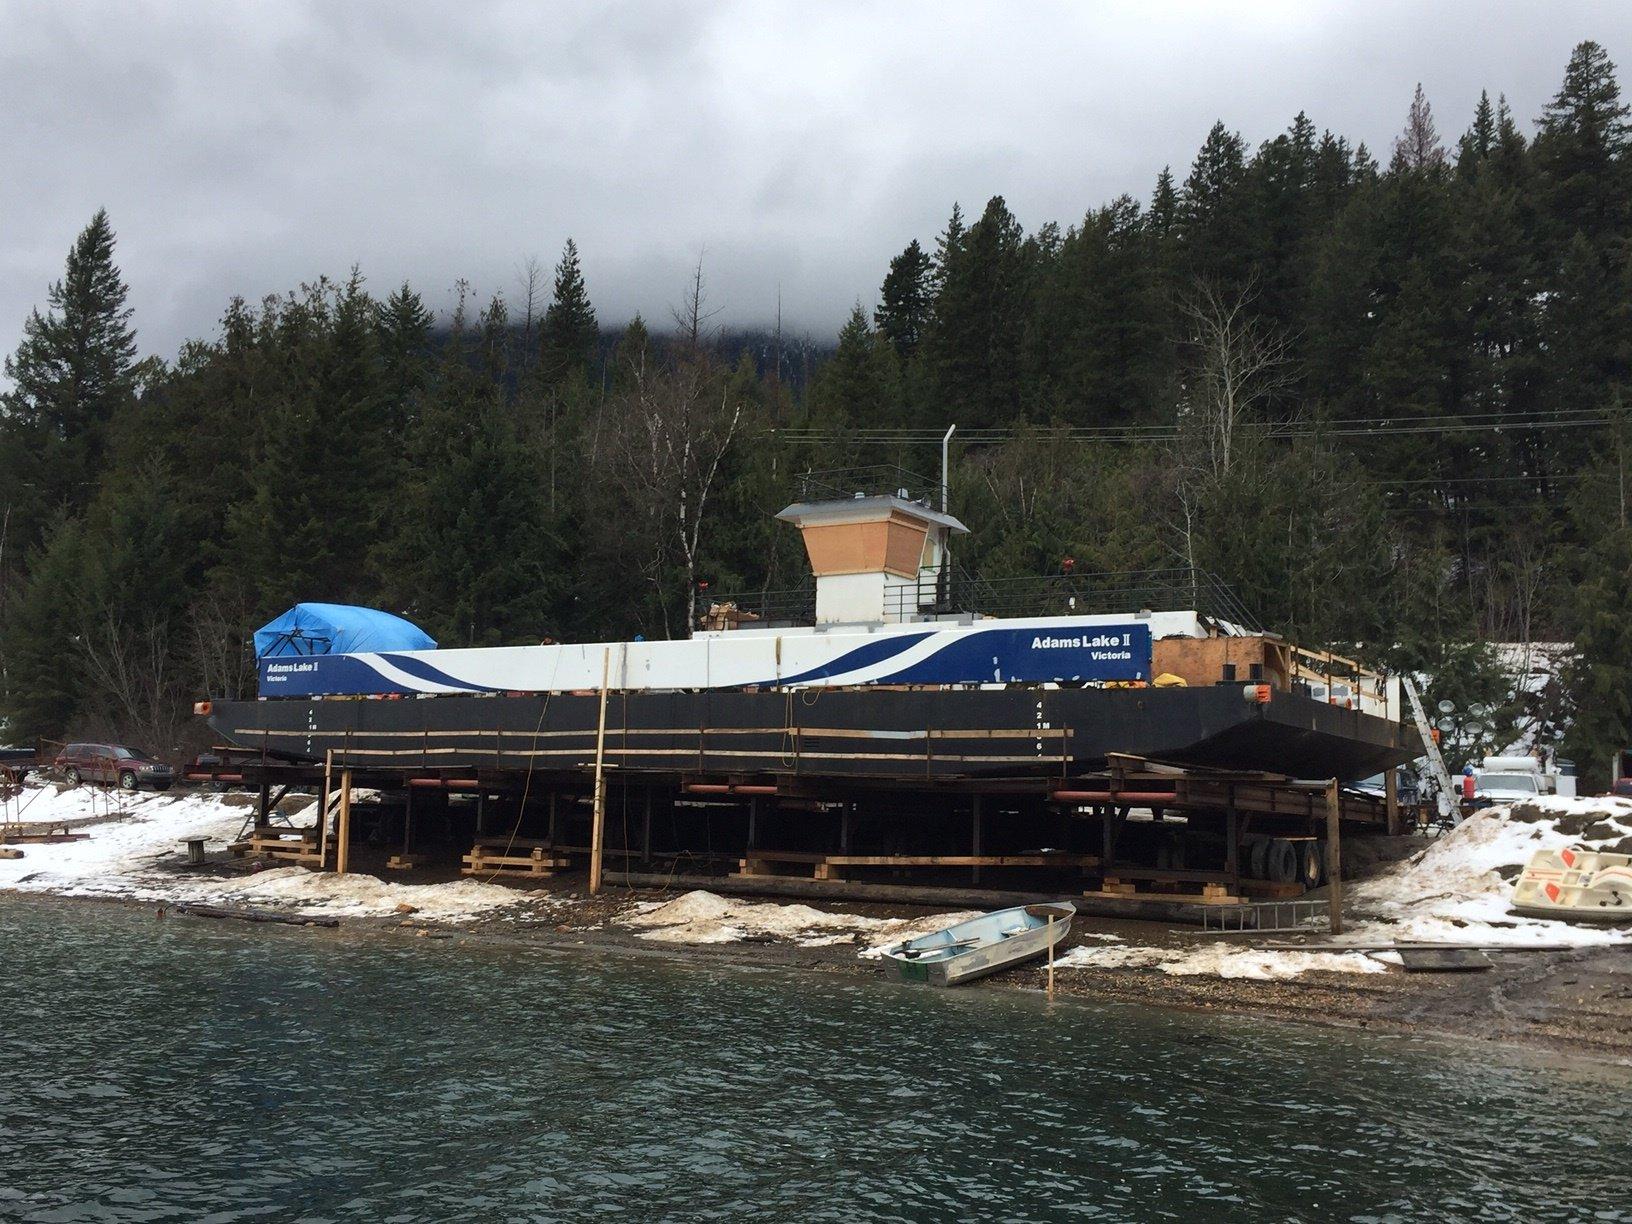 https://0901.nccdn.net/4_2/000/000/020/0be/adams-lake-ferry-ii.jpg